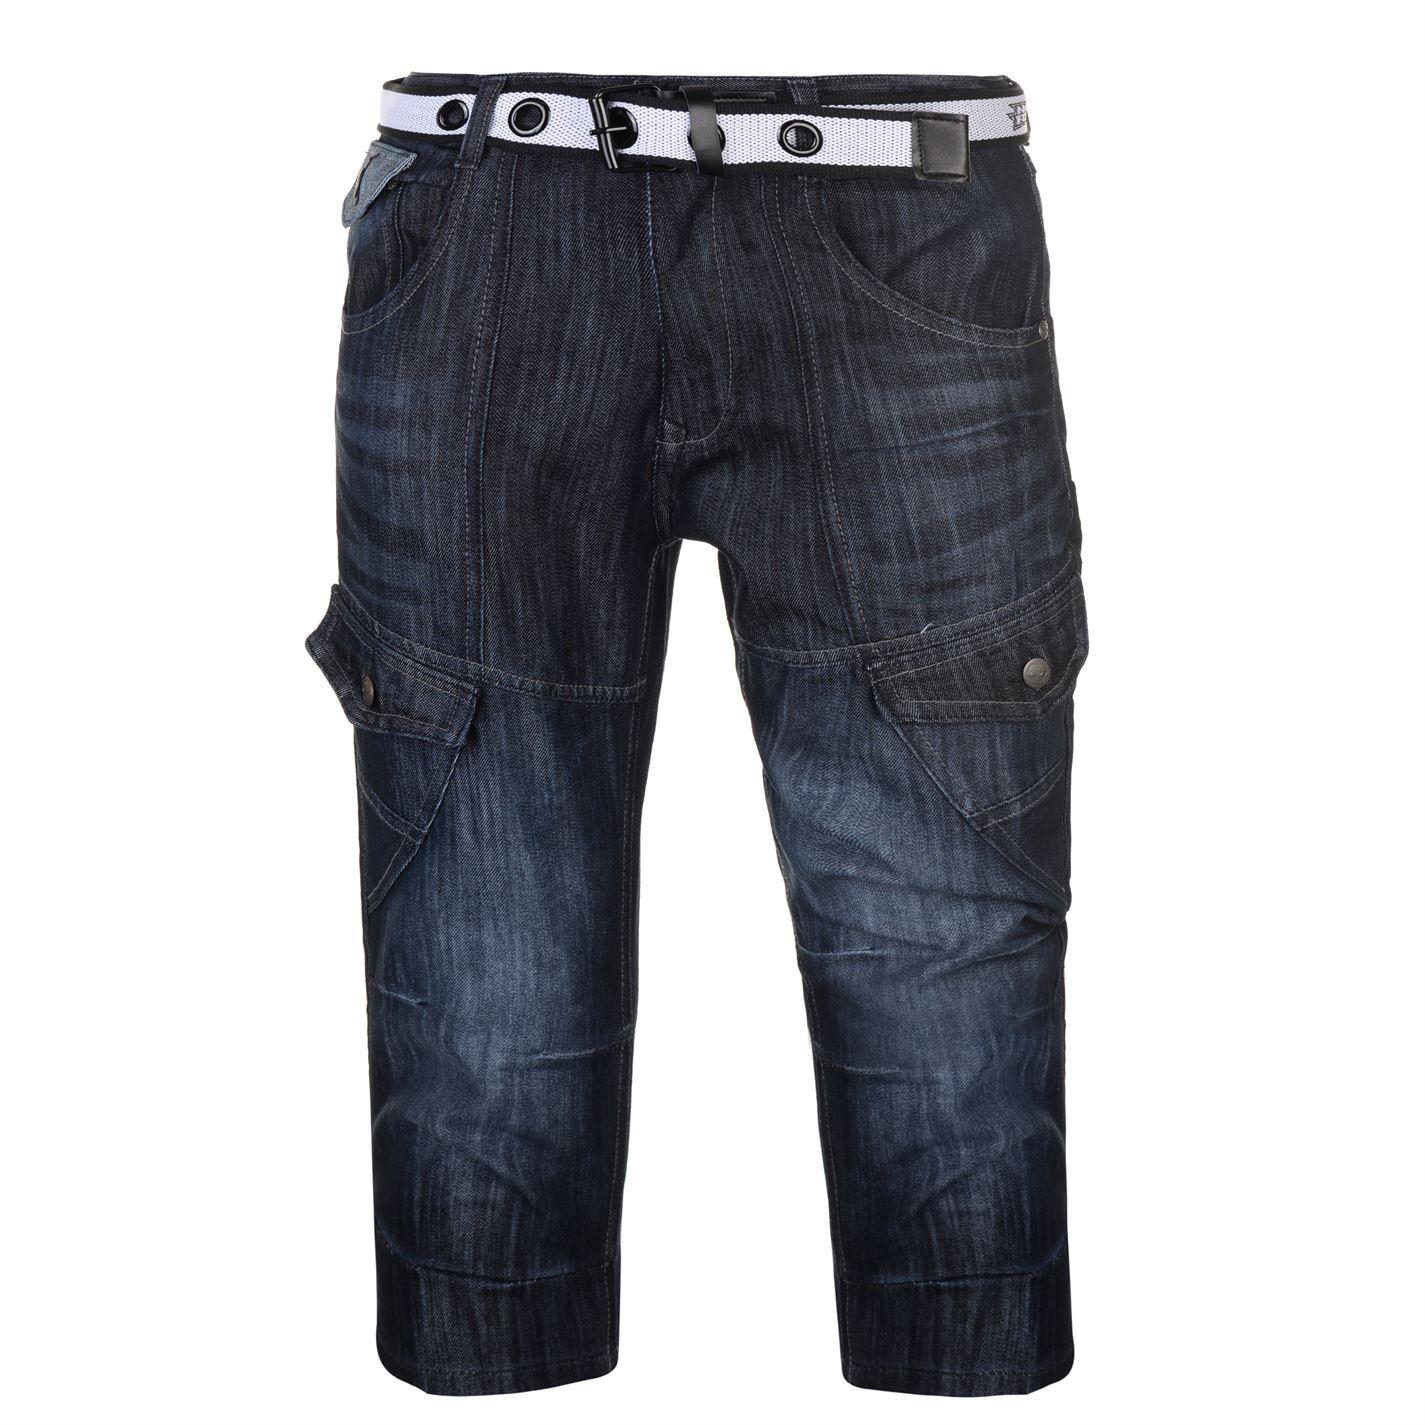 No-Fear-Belted-Cargo-Shorts-Mens-Bottoms-Short-Pants-Summerwear thumbnail 4